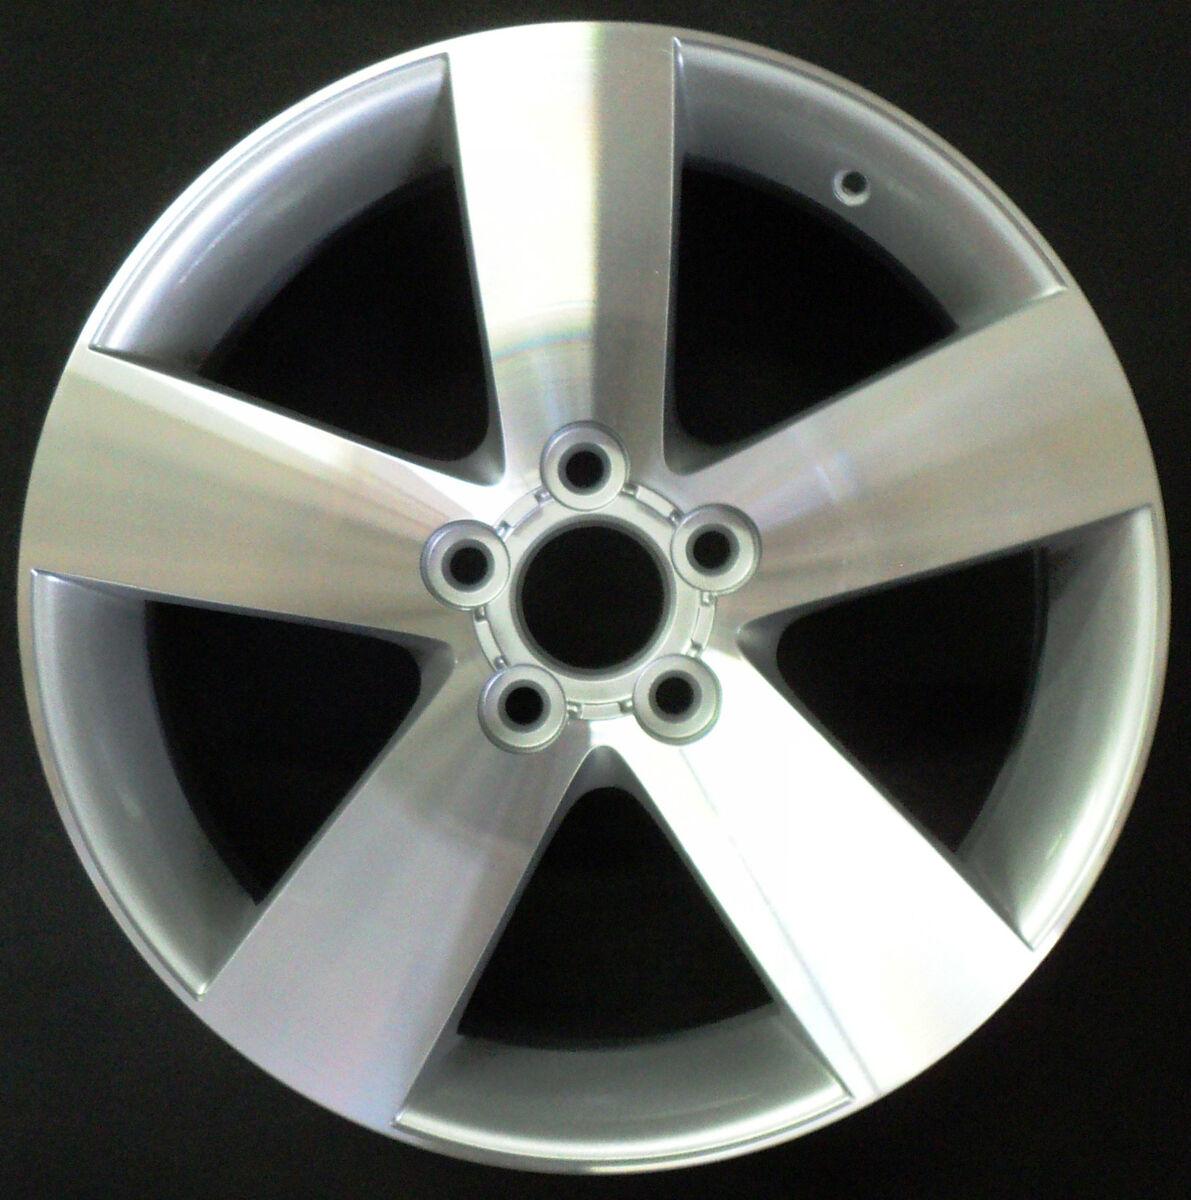 G8 2008 2009 19 5 Spoke Machined Finish Factory OEM Wheel Rim H# 6640